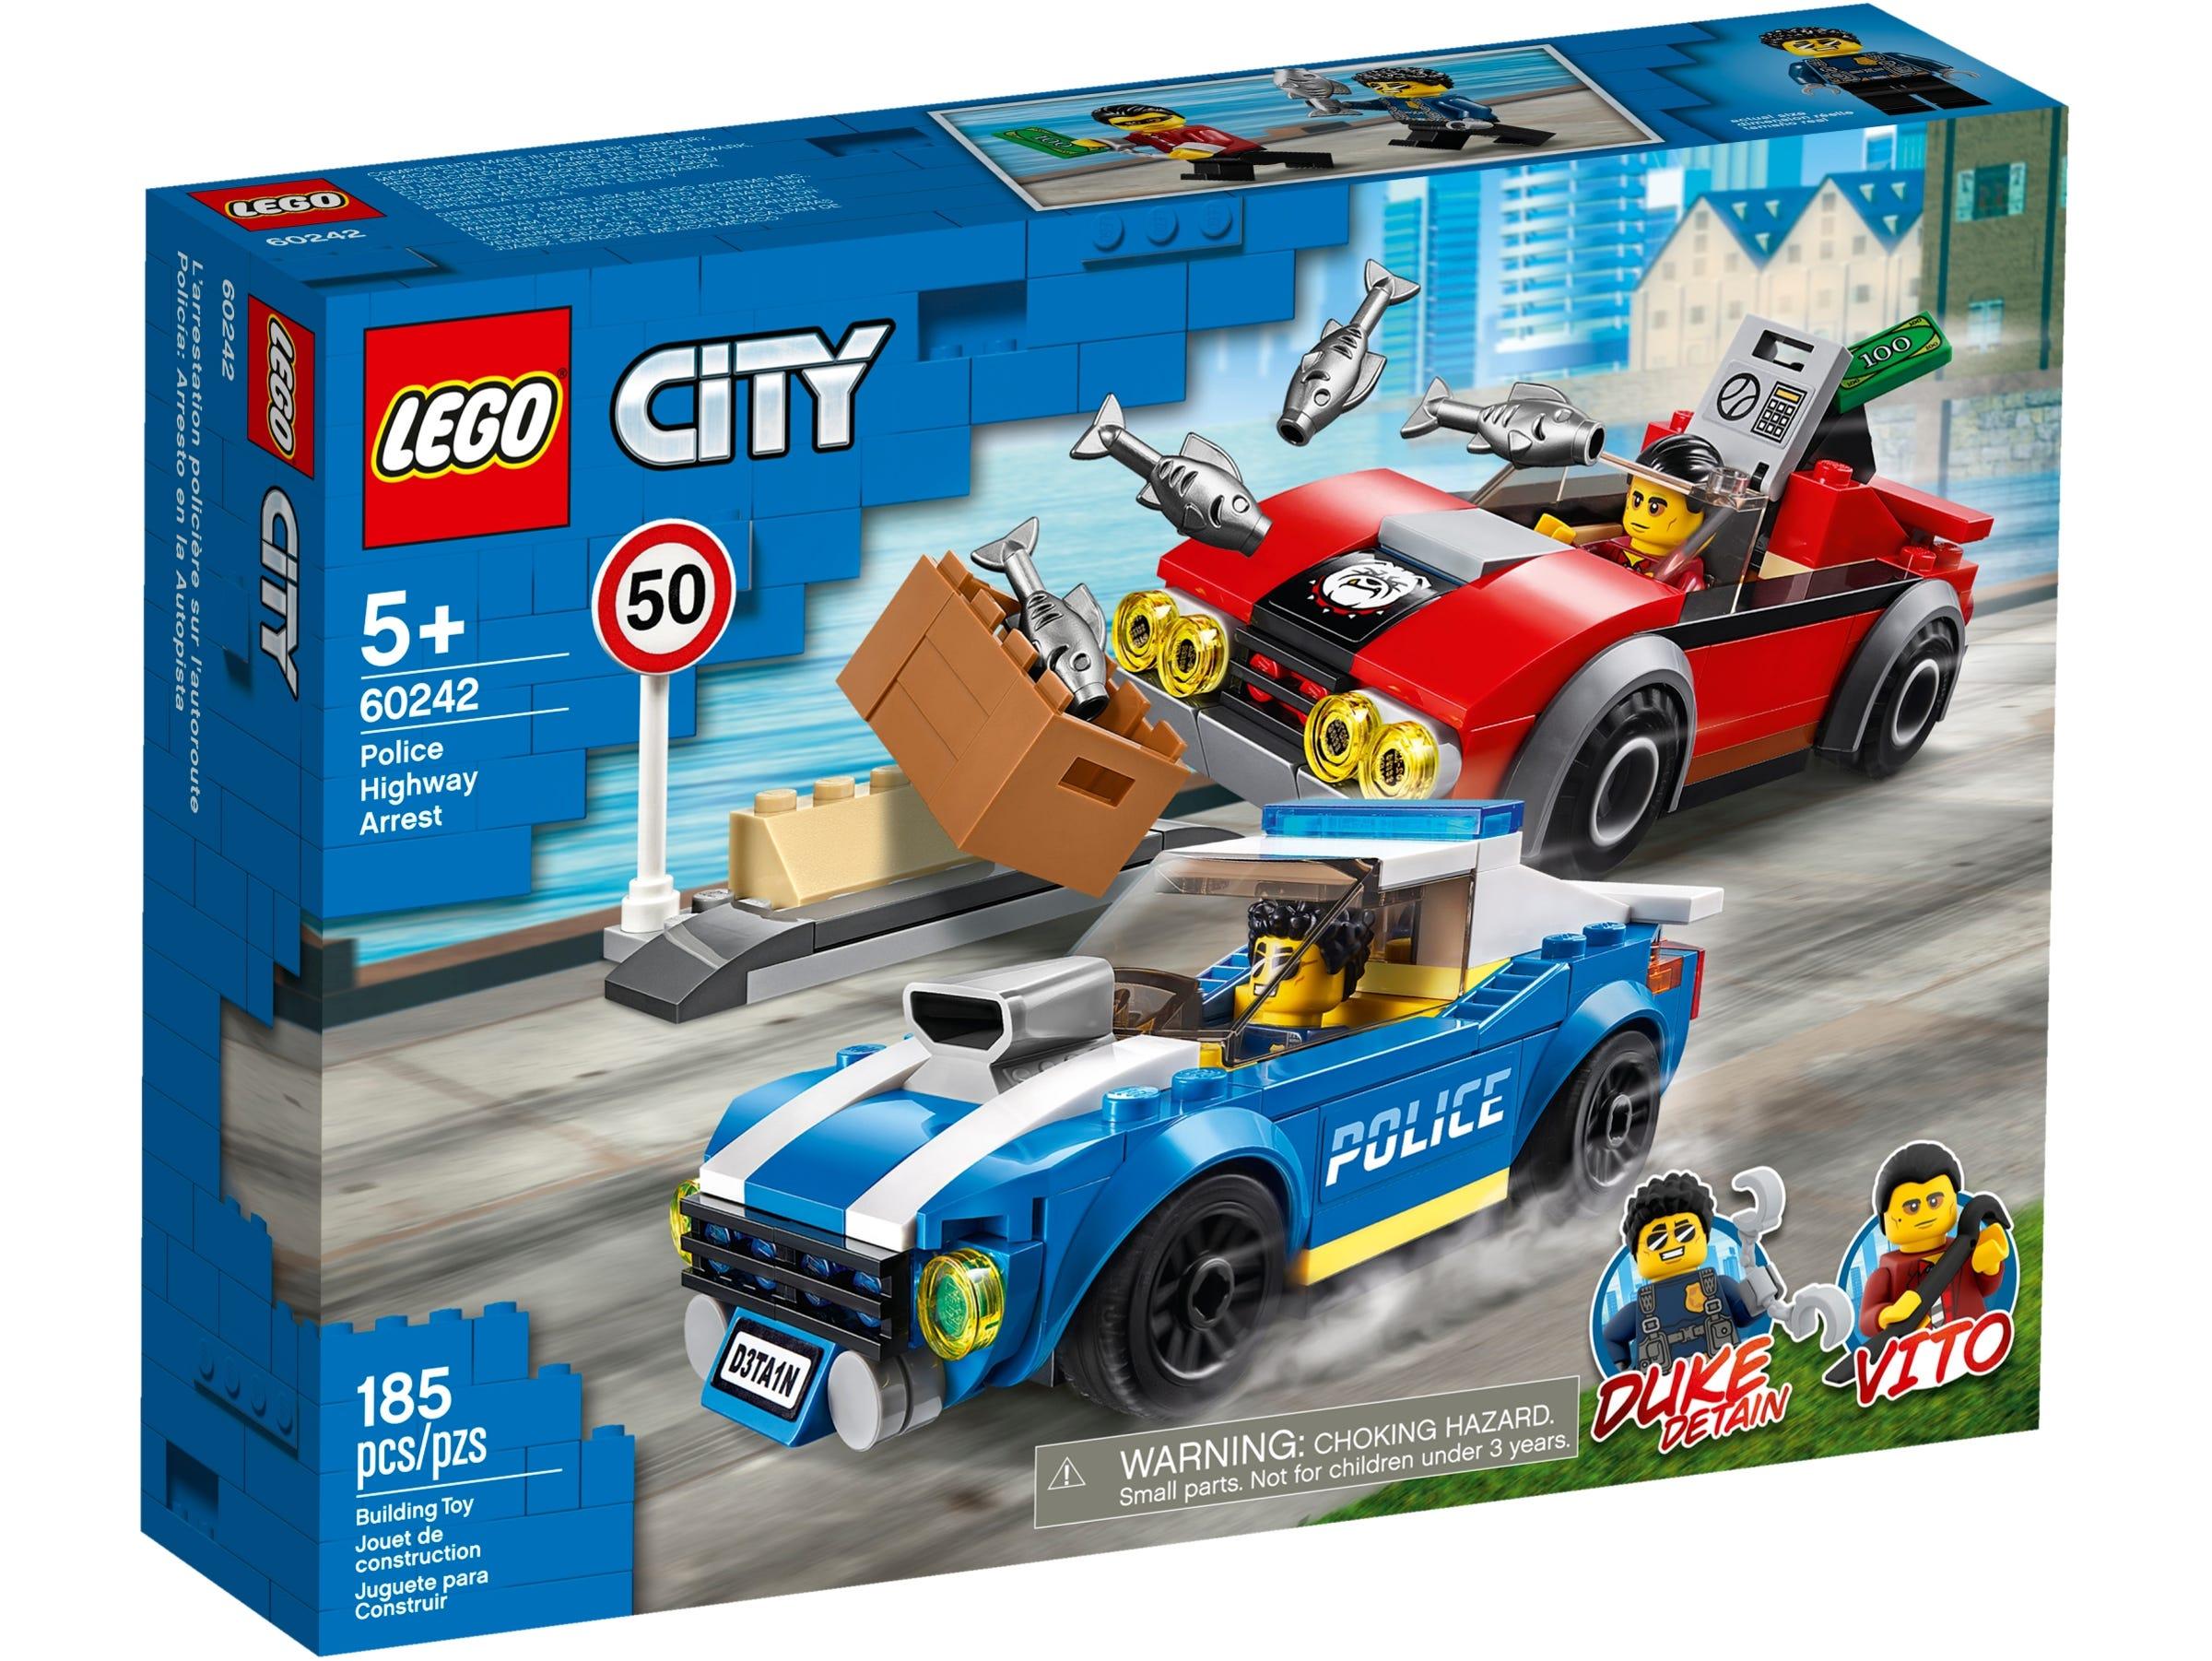 LEGO City - Police Highway Arrest (60242)